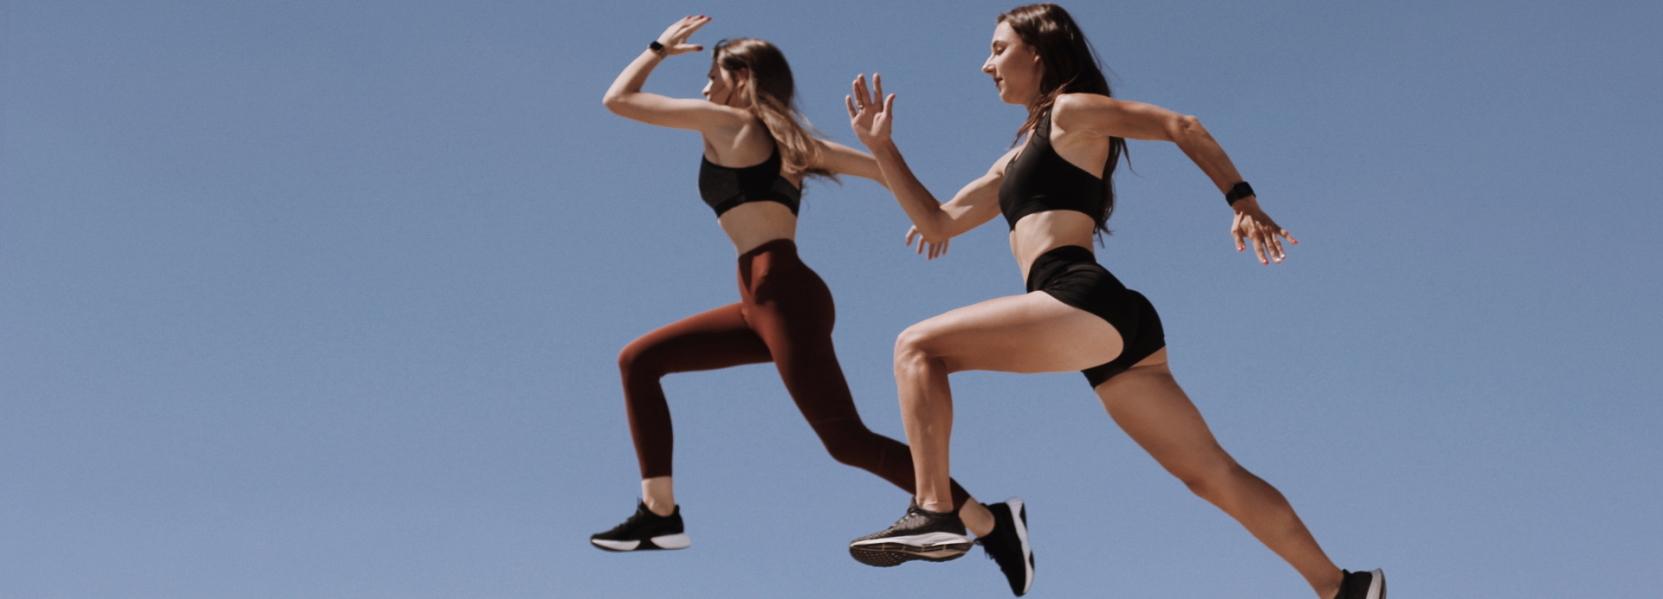 Курс для суставов и мышц